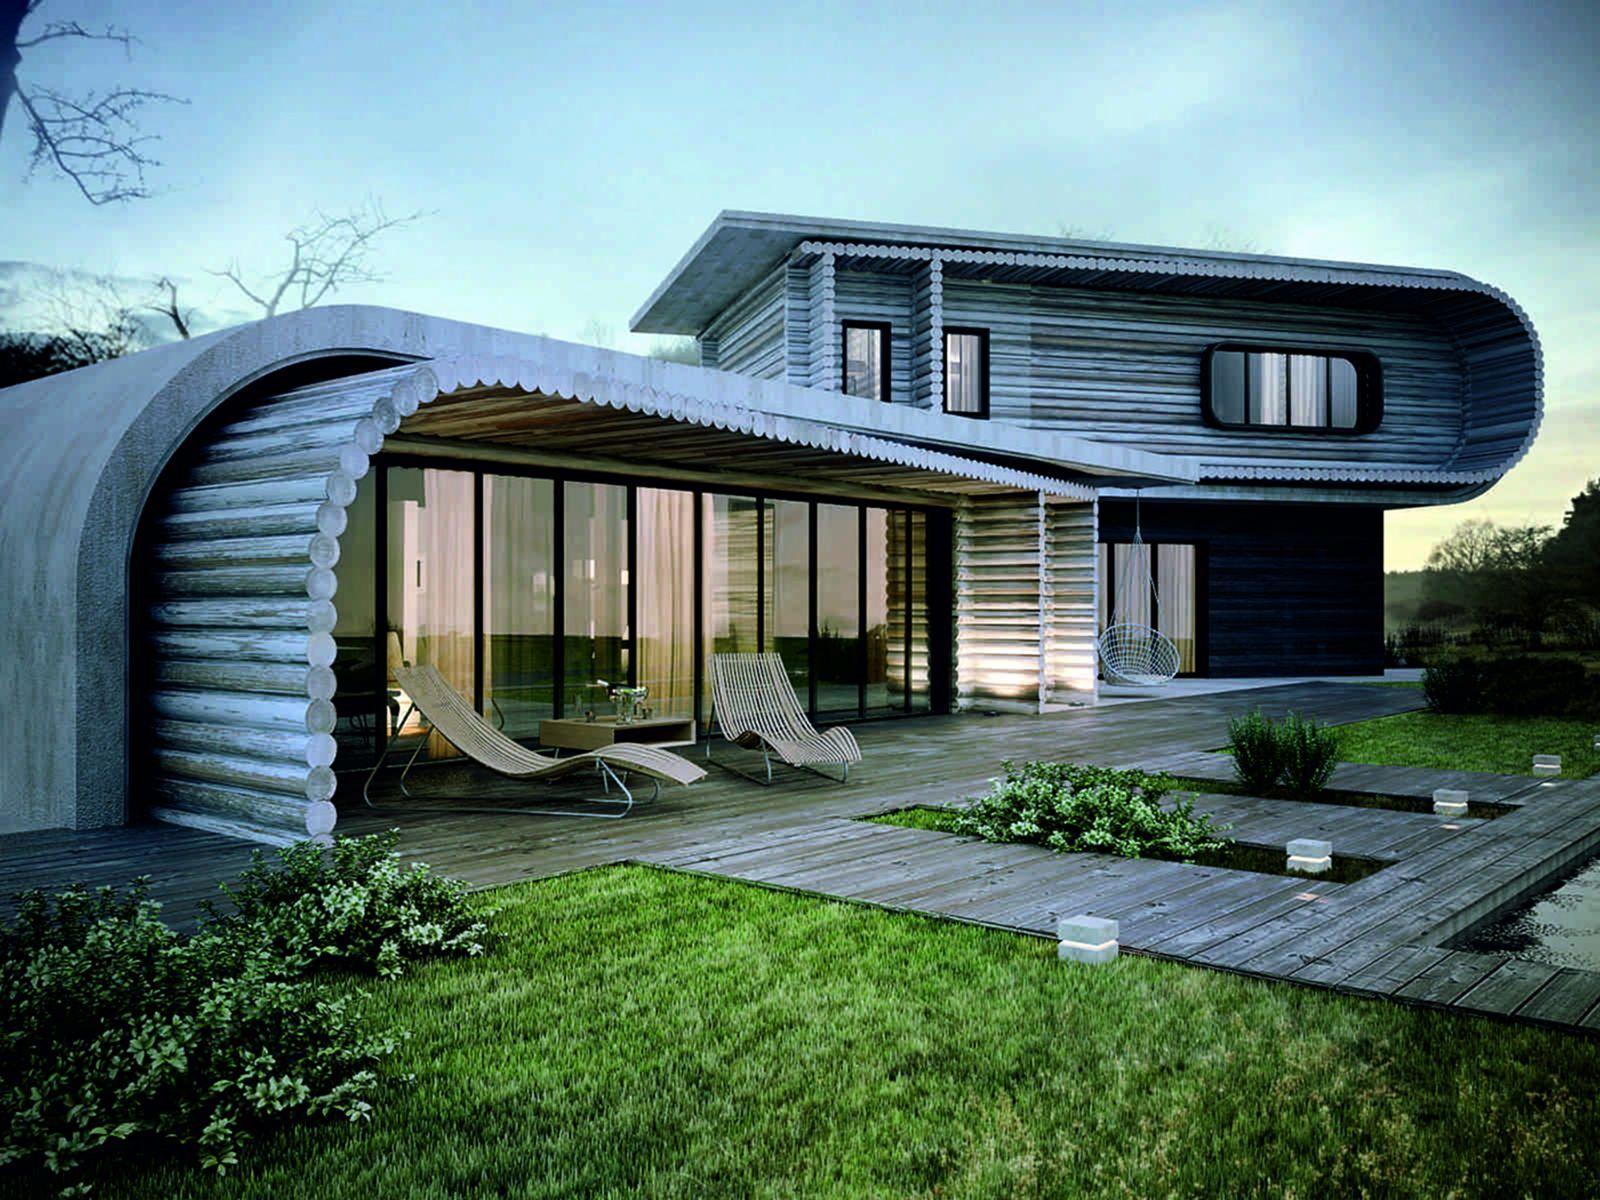 38 Inspiring Wooden Houses Design Ideas Eco Friendly Small Lake Houses Lake Houses Exterior Wooden House Design